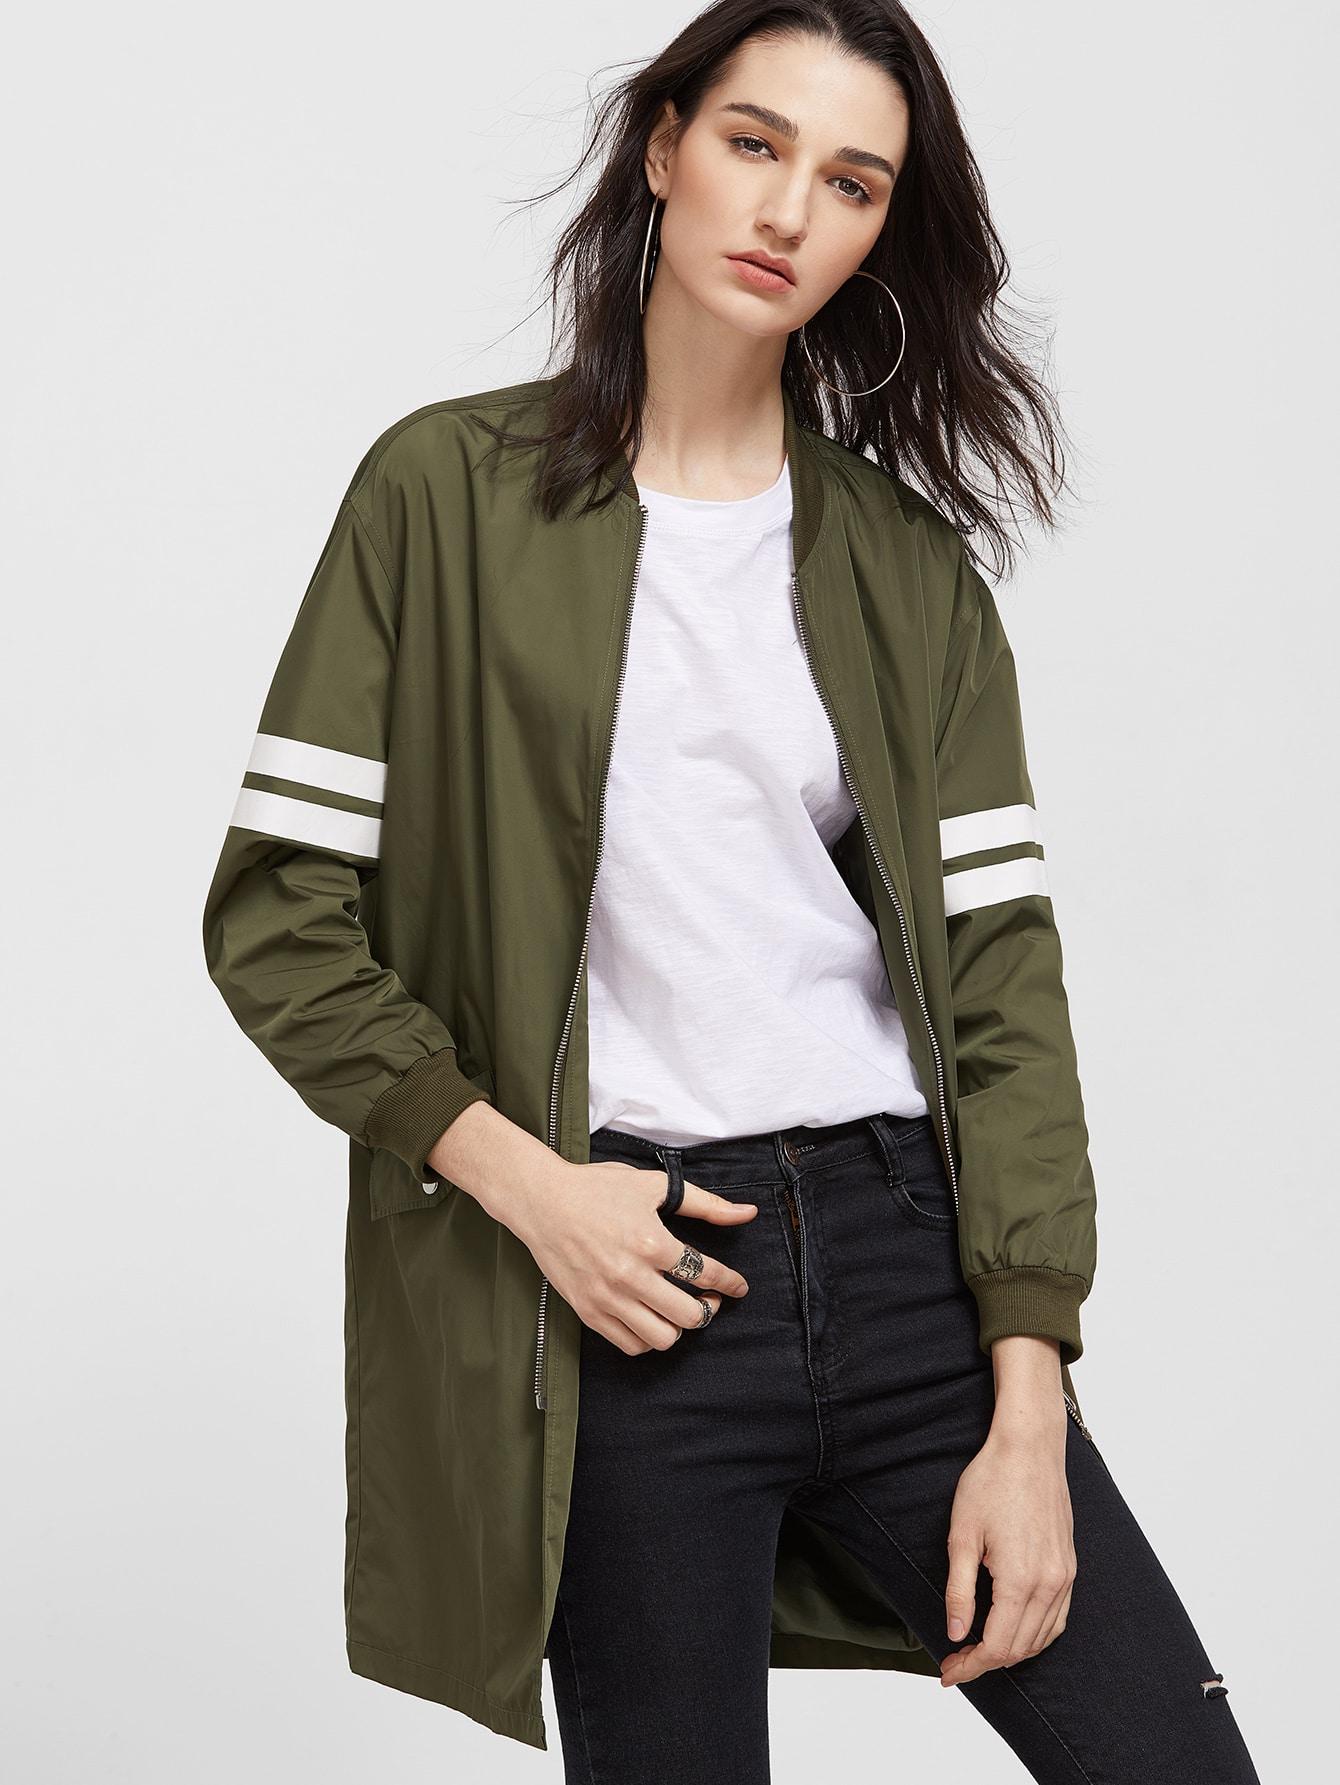 Olive Green Striped Sleeve Longline Zip Up Bomber Jacket striped trim fluffy panel bomber jacket